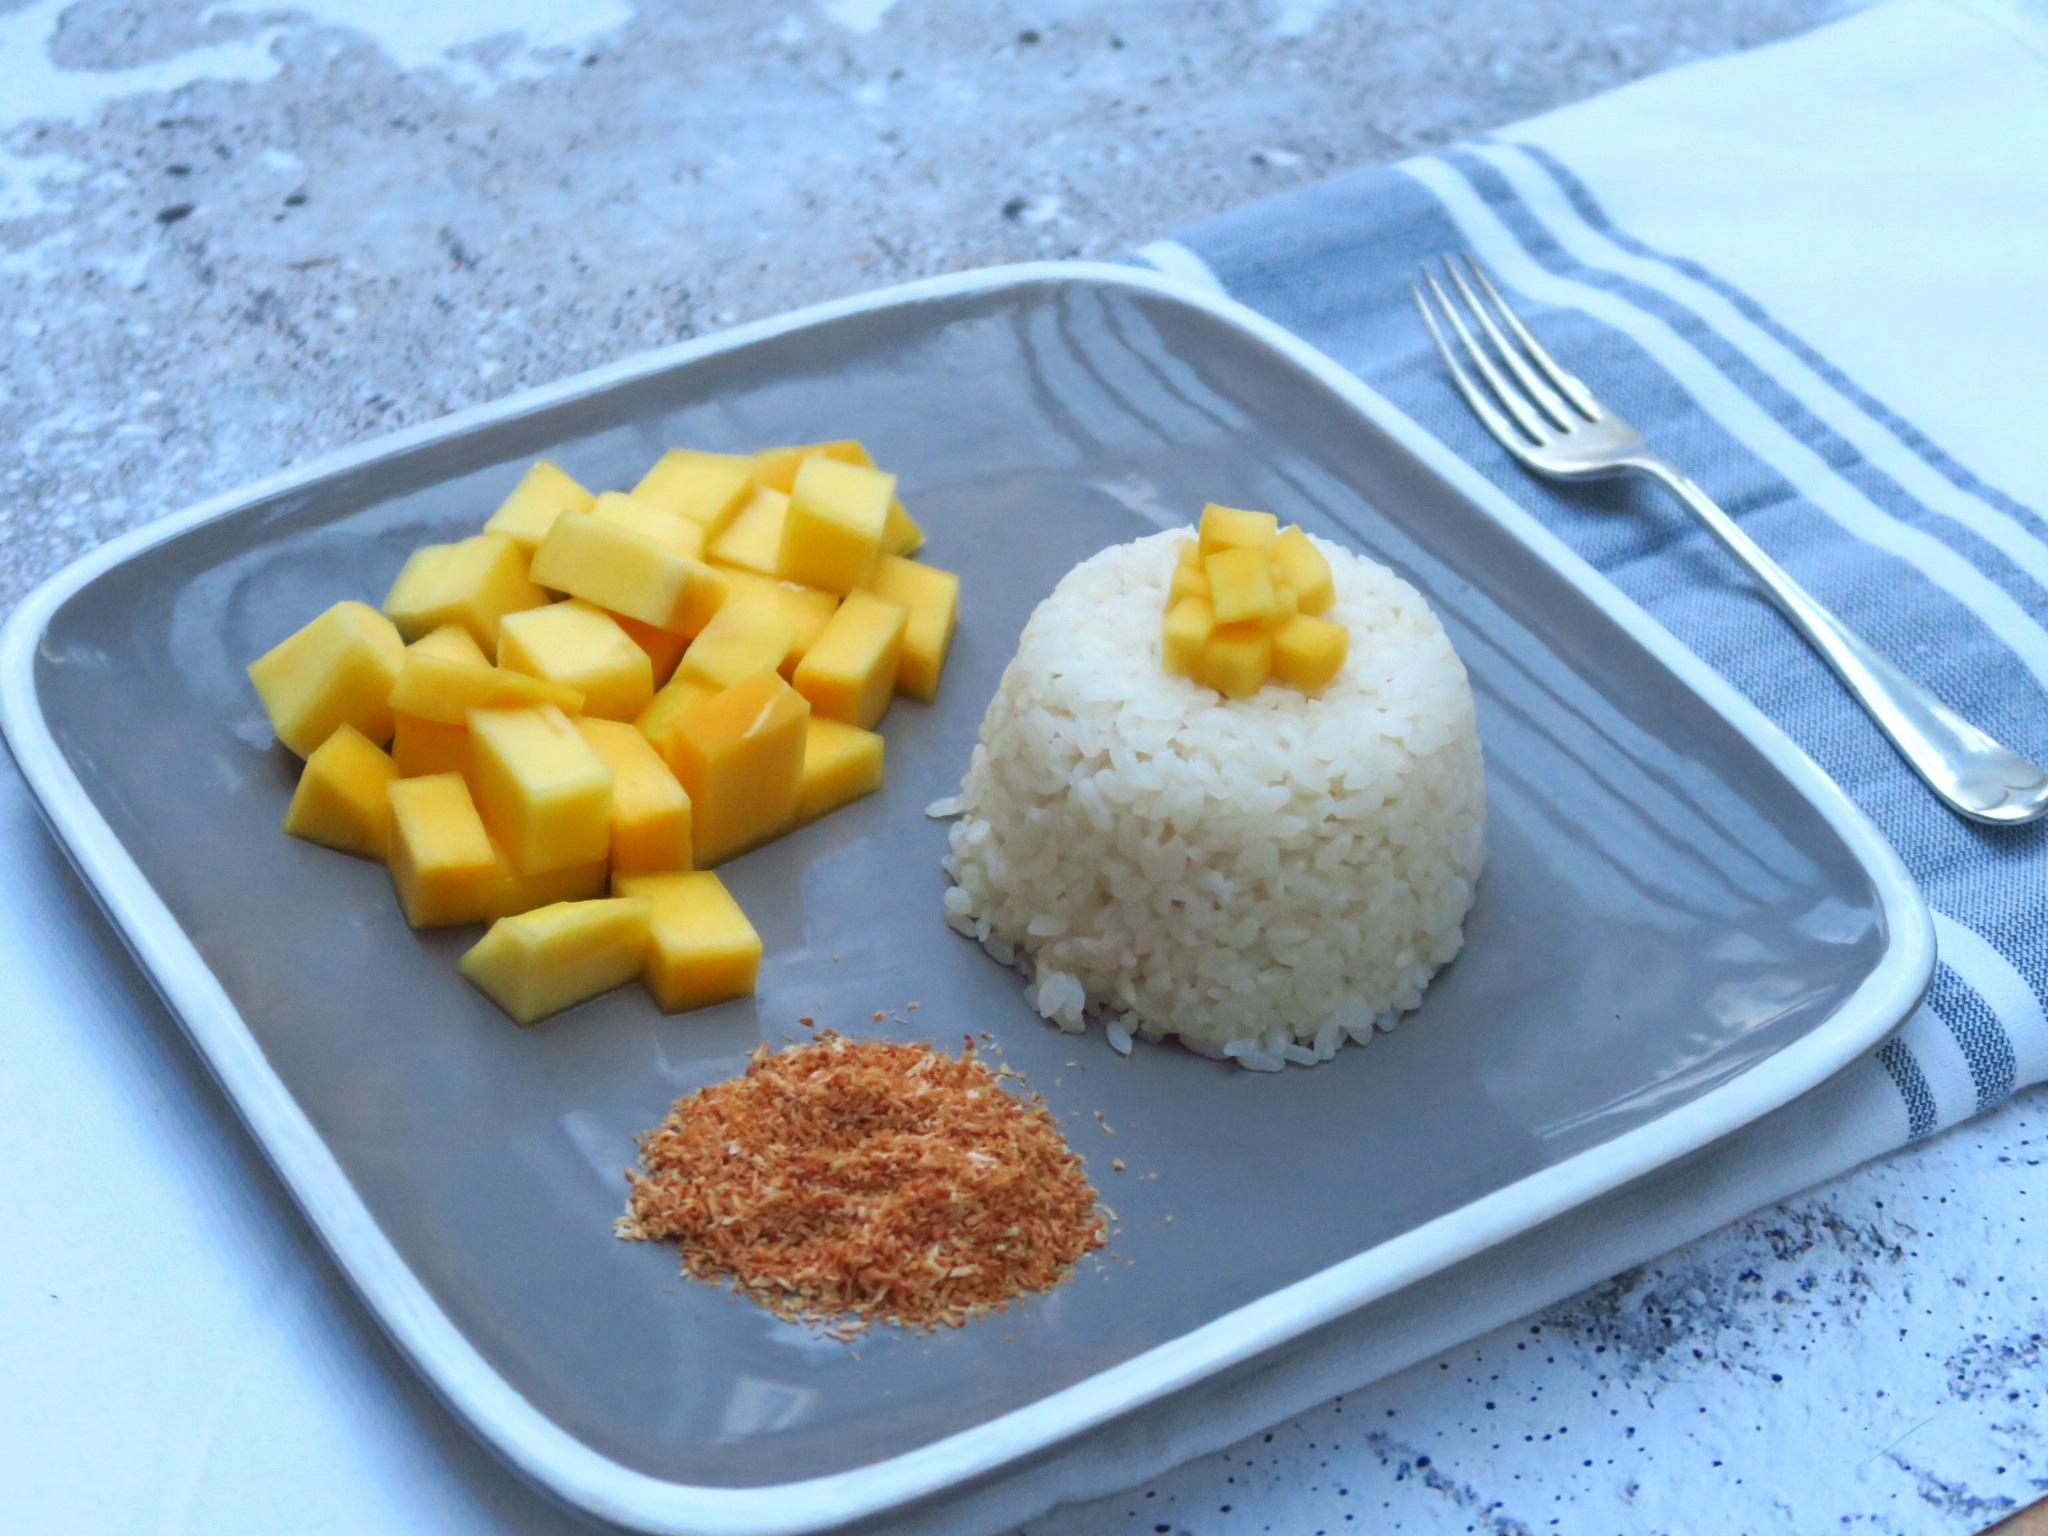 Mango+sticky+rice++%283%29.jpg